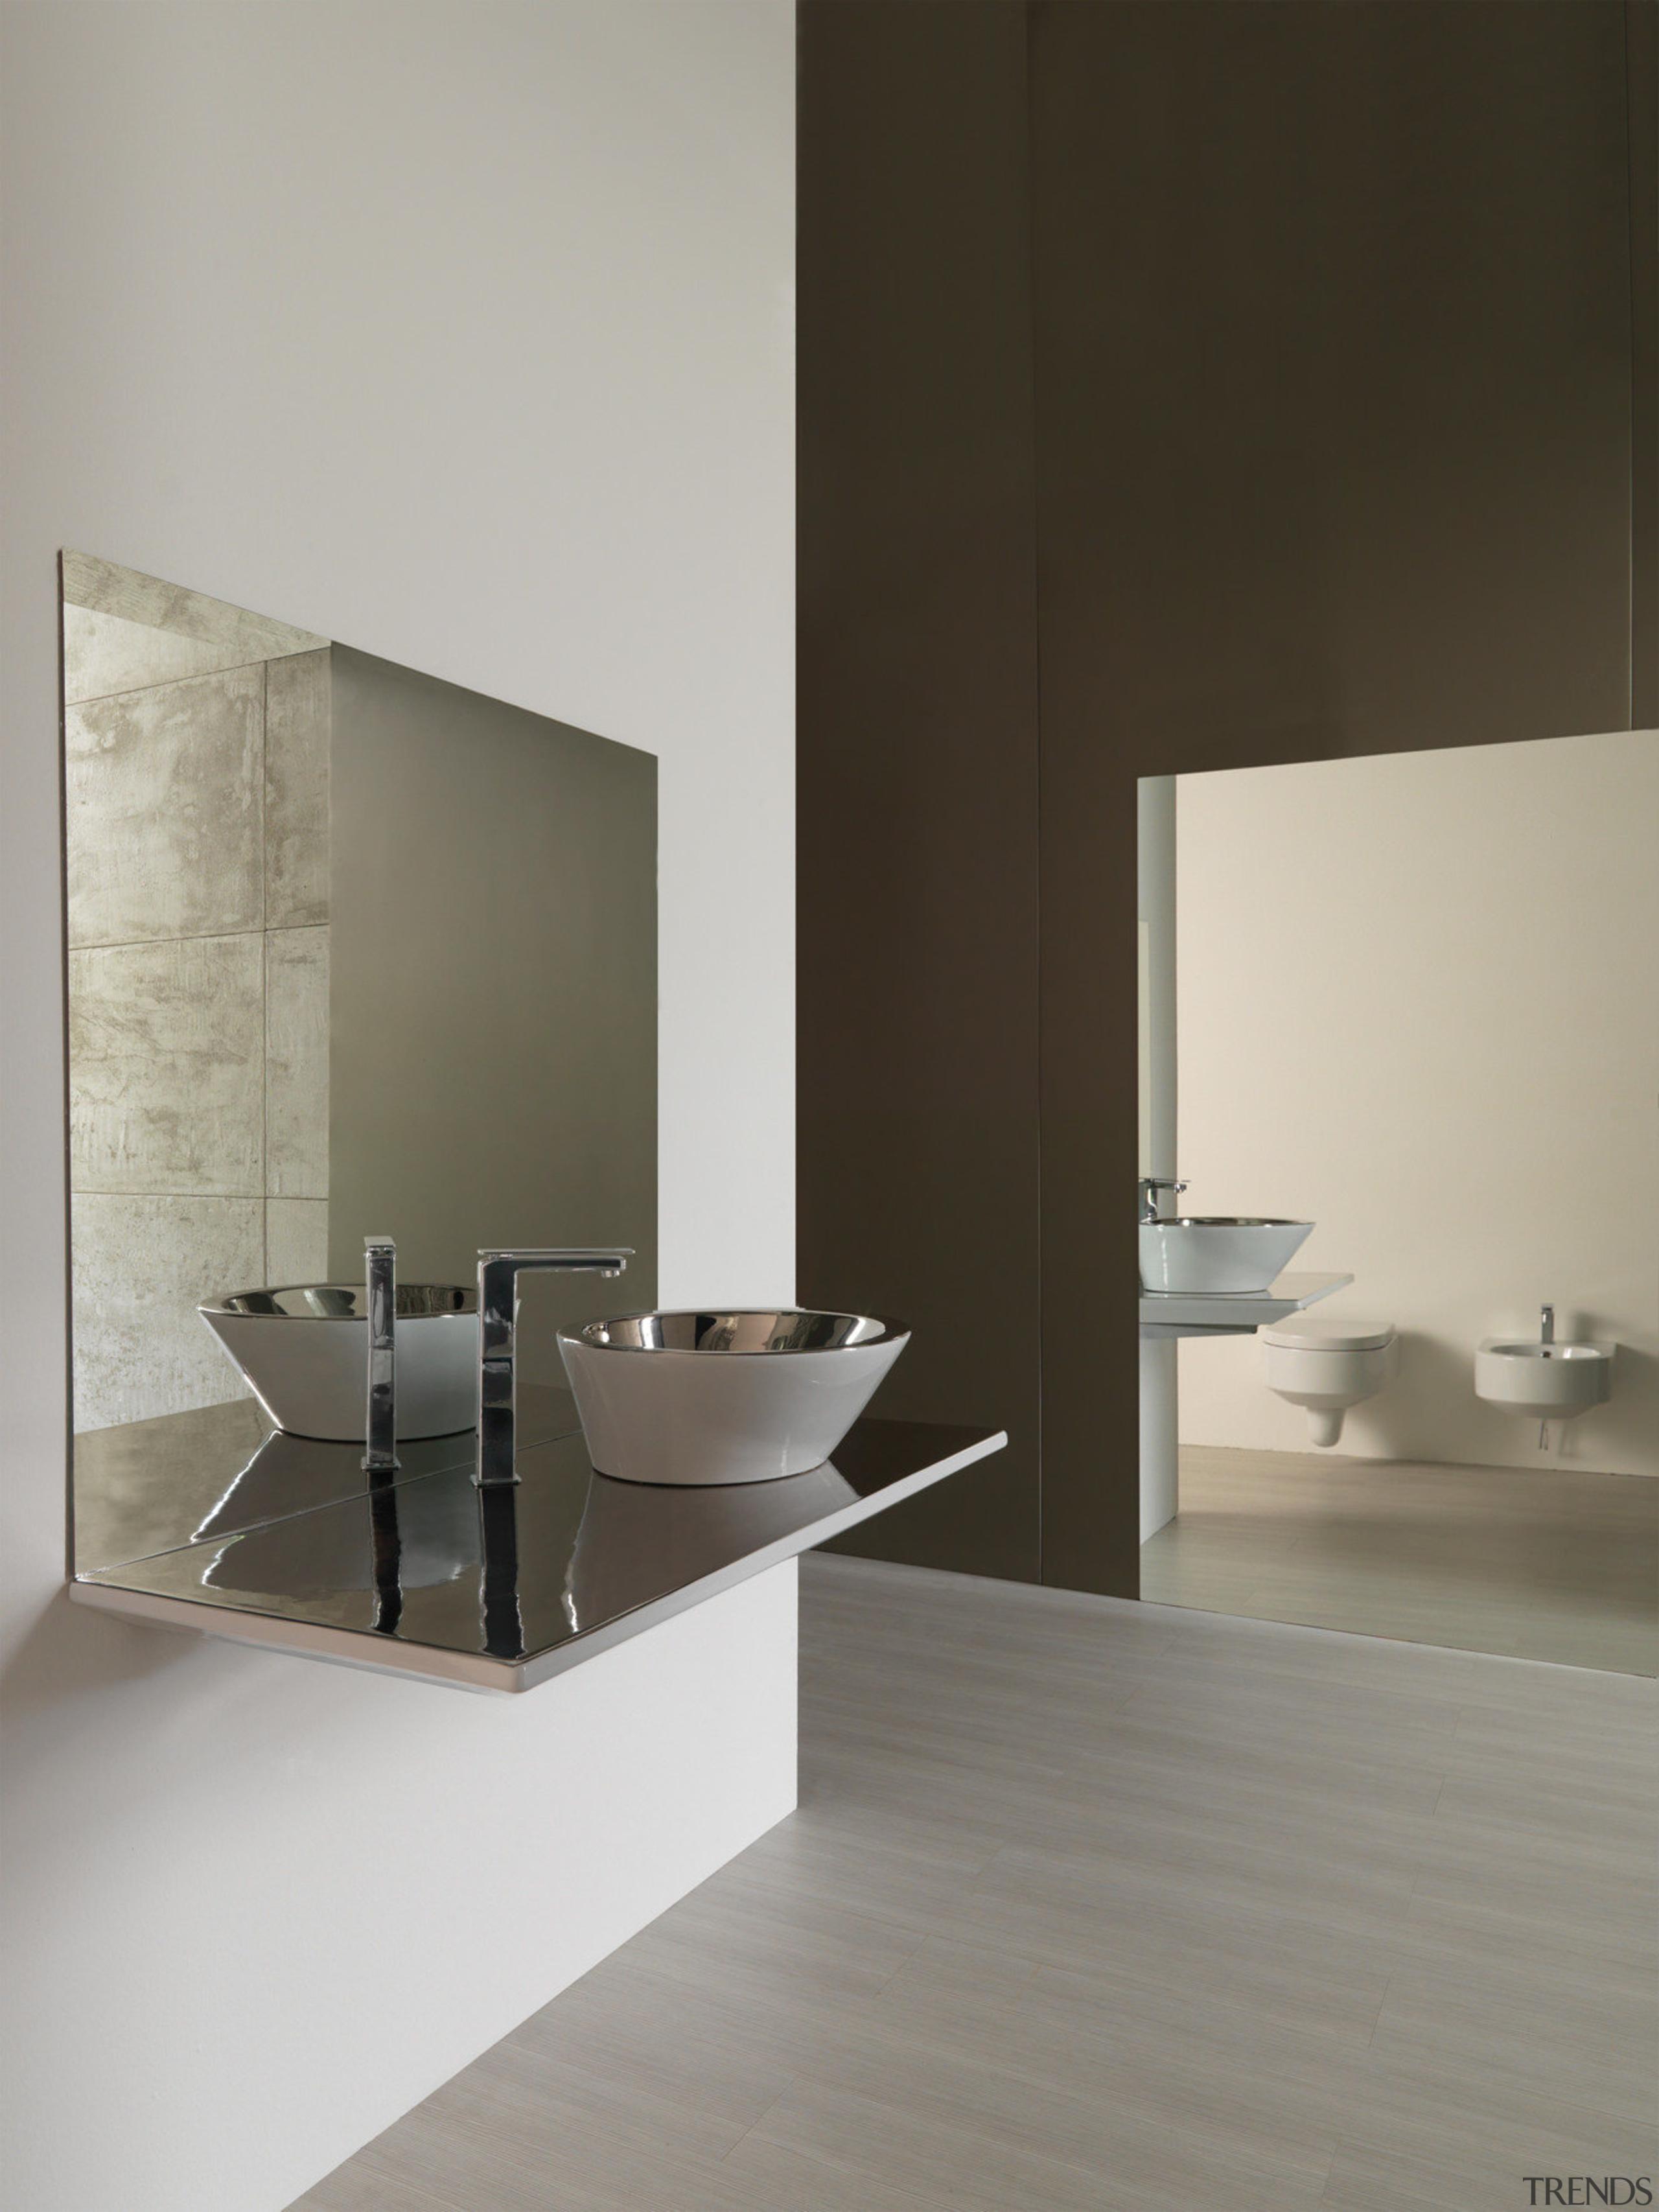 Studio Bagnos couture Svaso Tondo bench basin is architecture, bathroom, bathroom accessory, floor, interior design, product design, sink, tap, gray, black